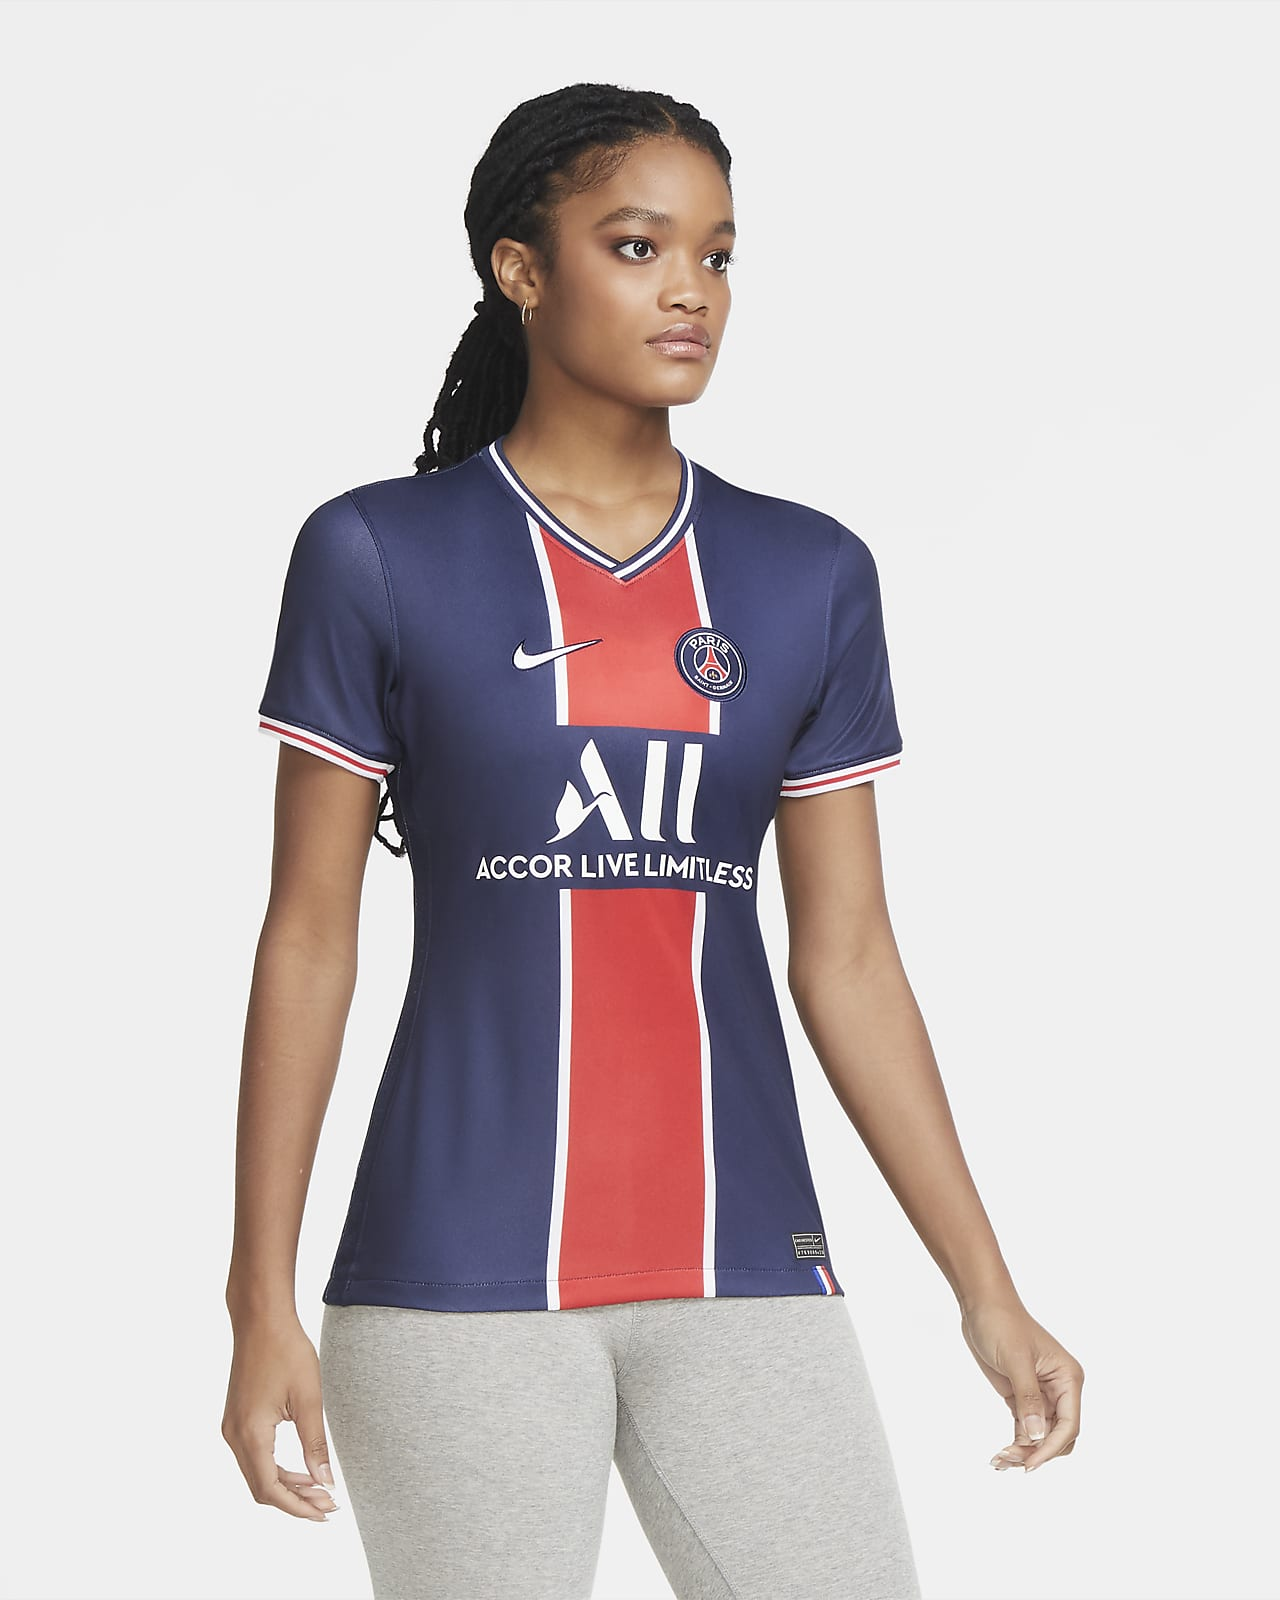 Paris Saint-Germain 2020/21 Stadium Home Damen-Fußballtrikot